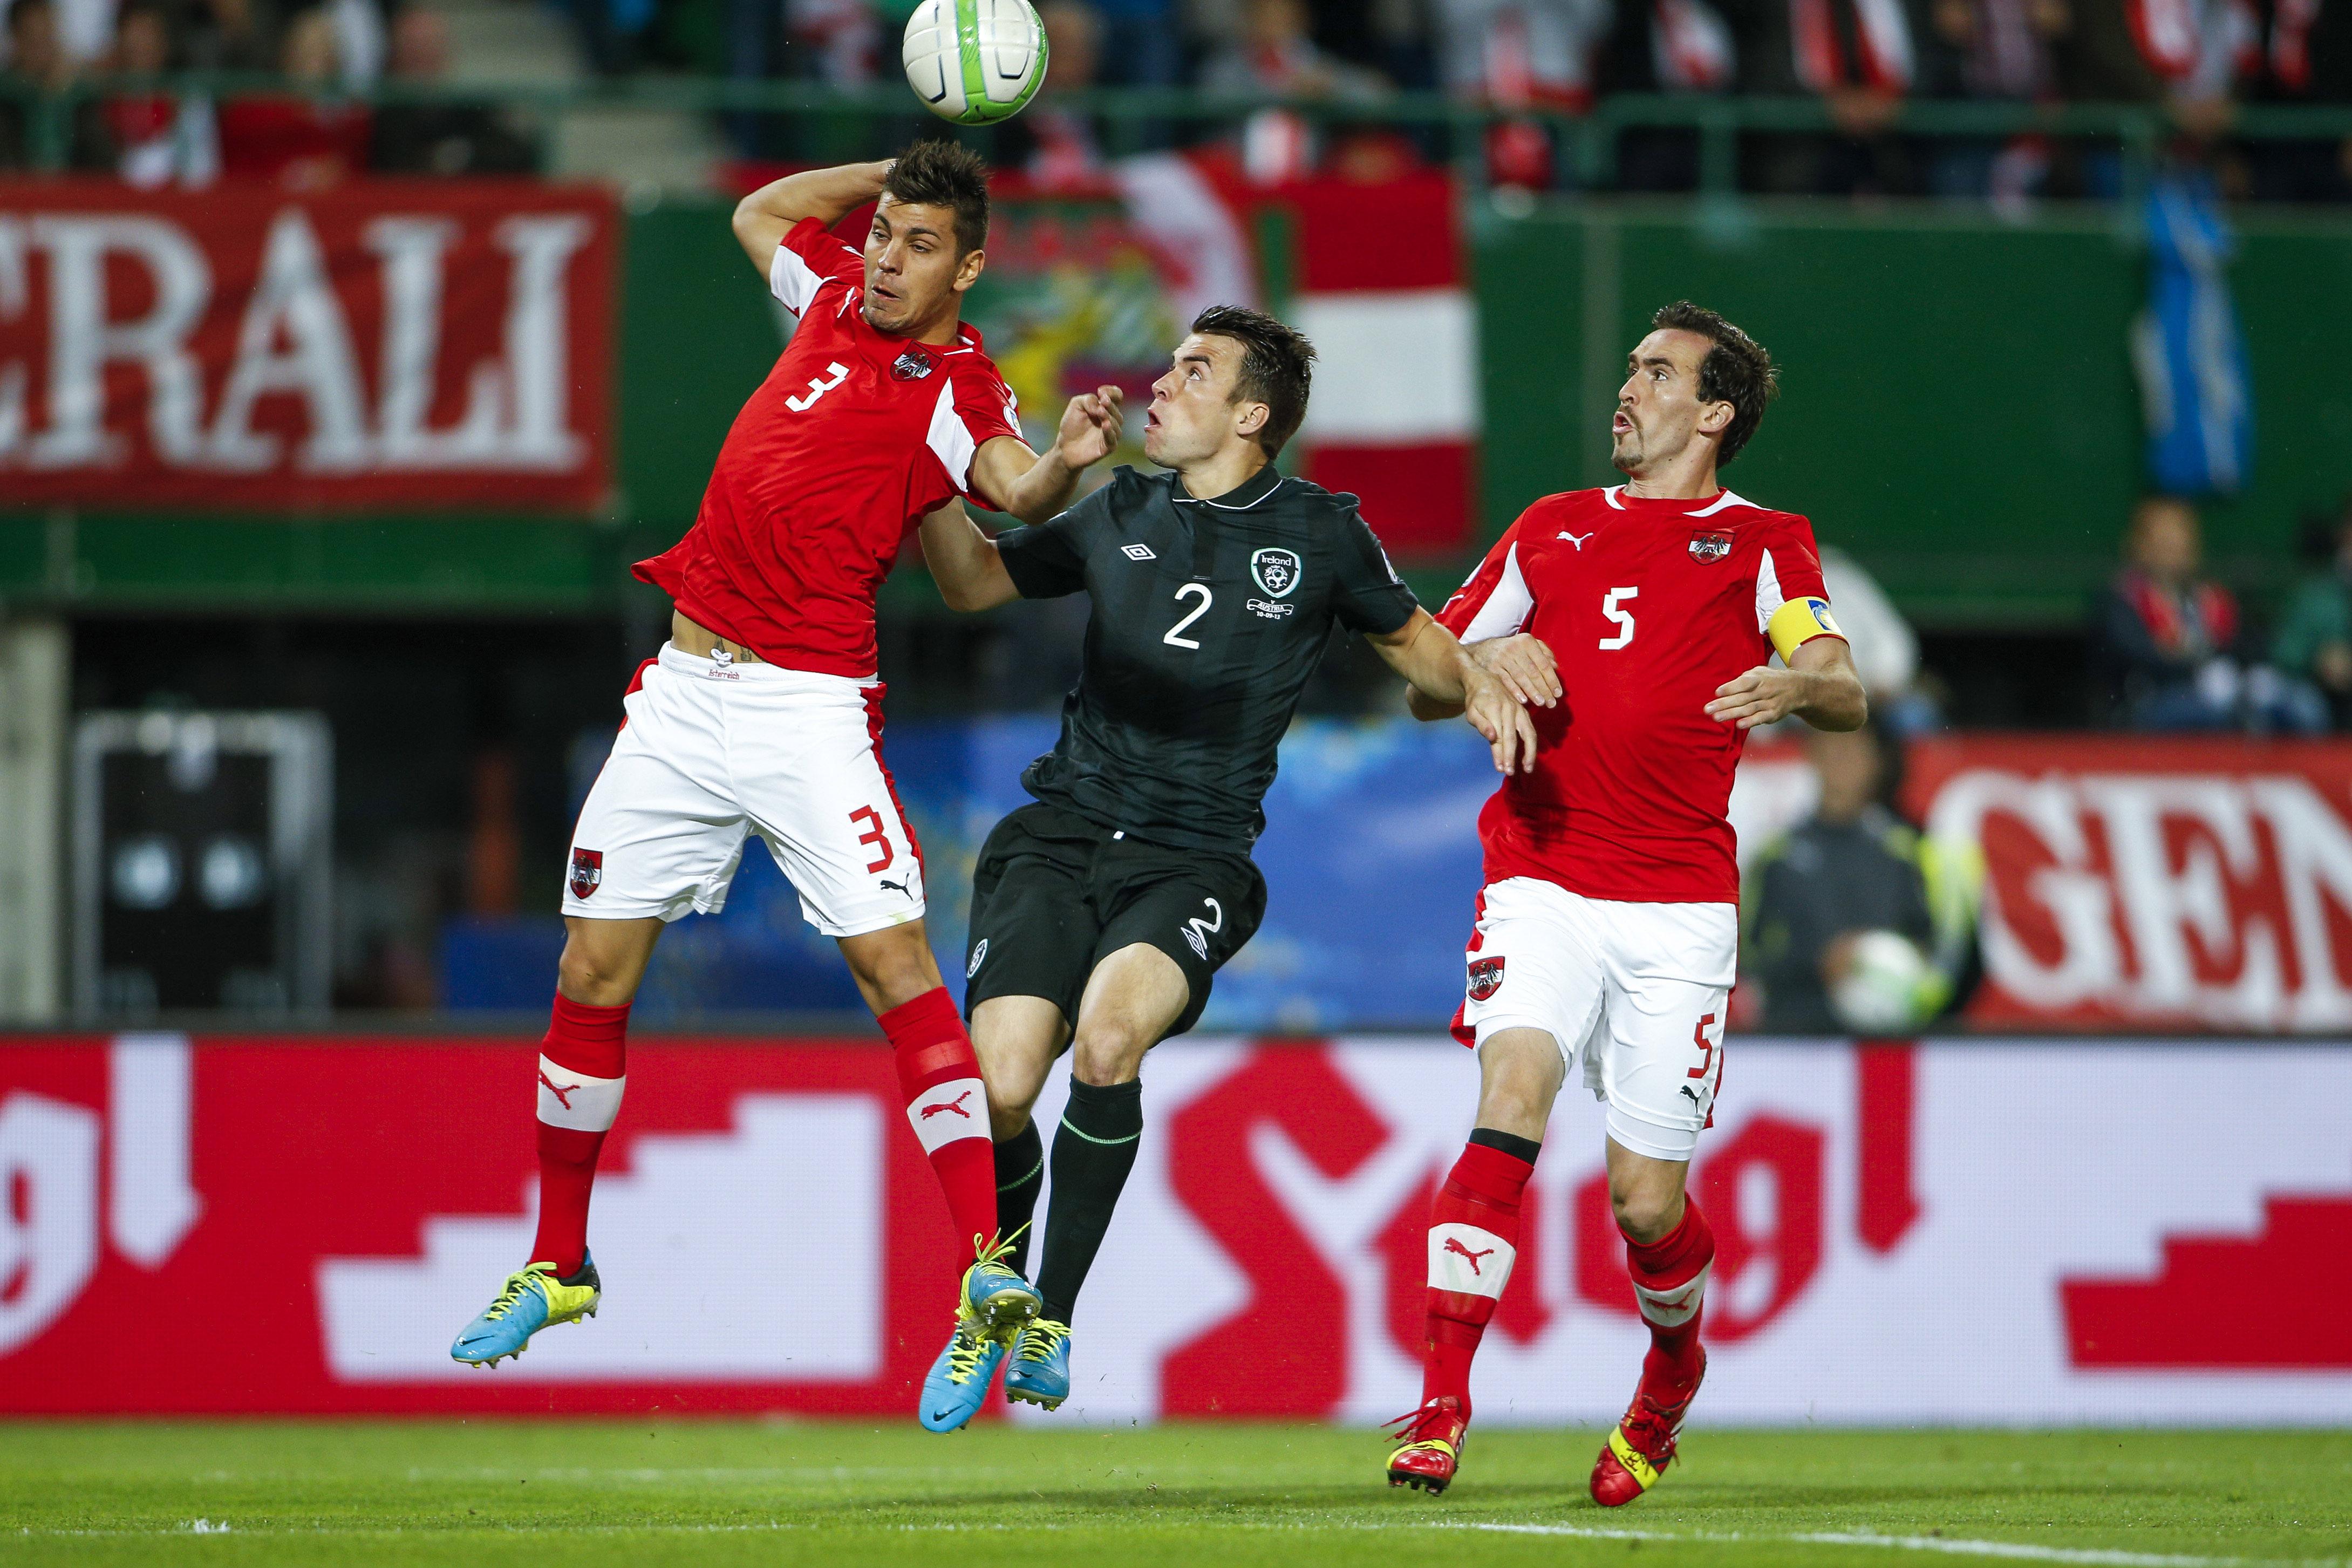 Austria v Republic of Ireland - FIFA 2014 World Cup Qualifier